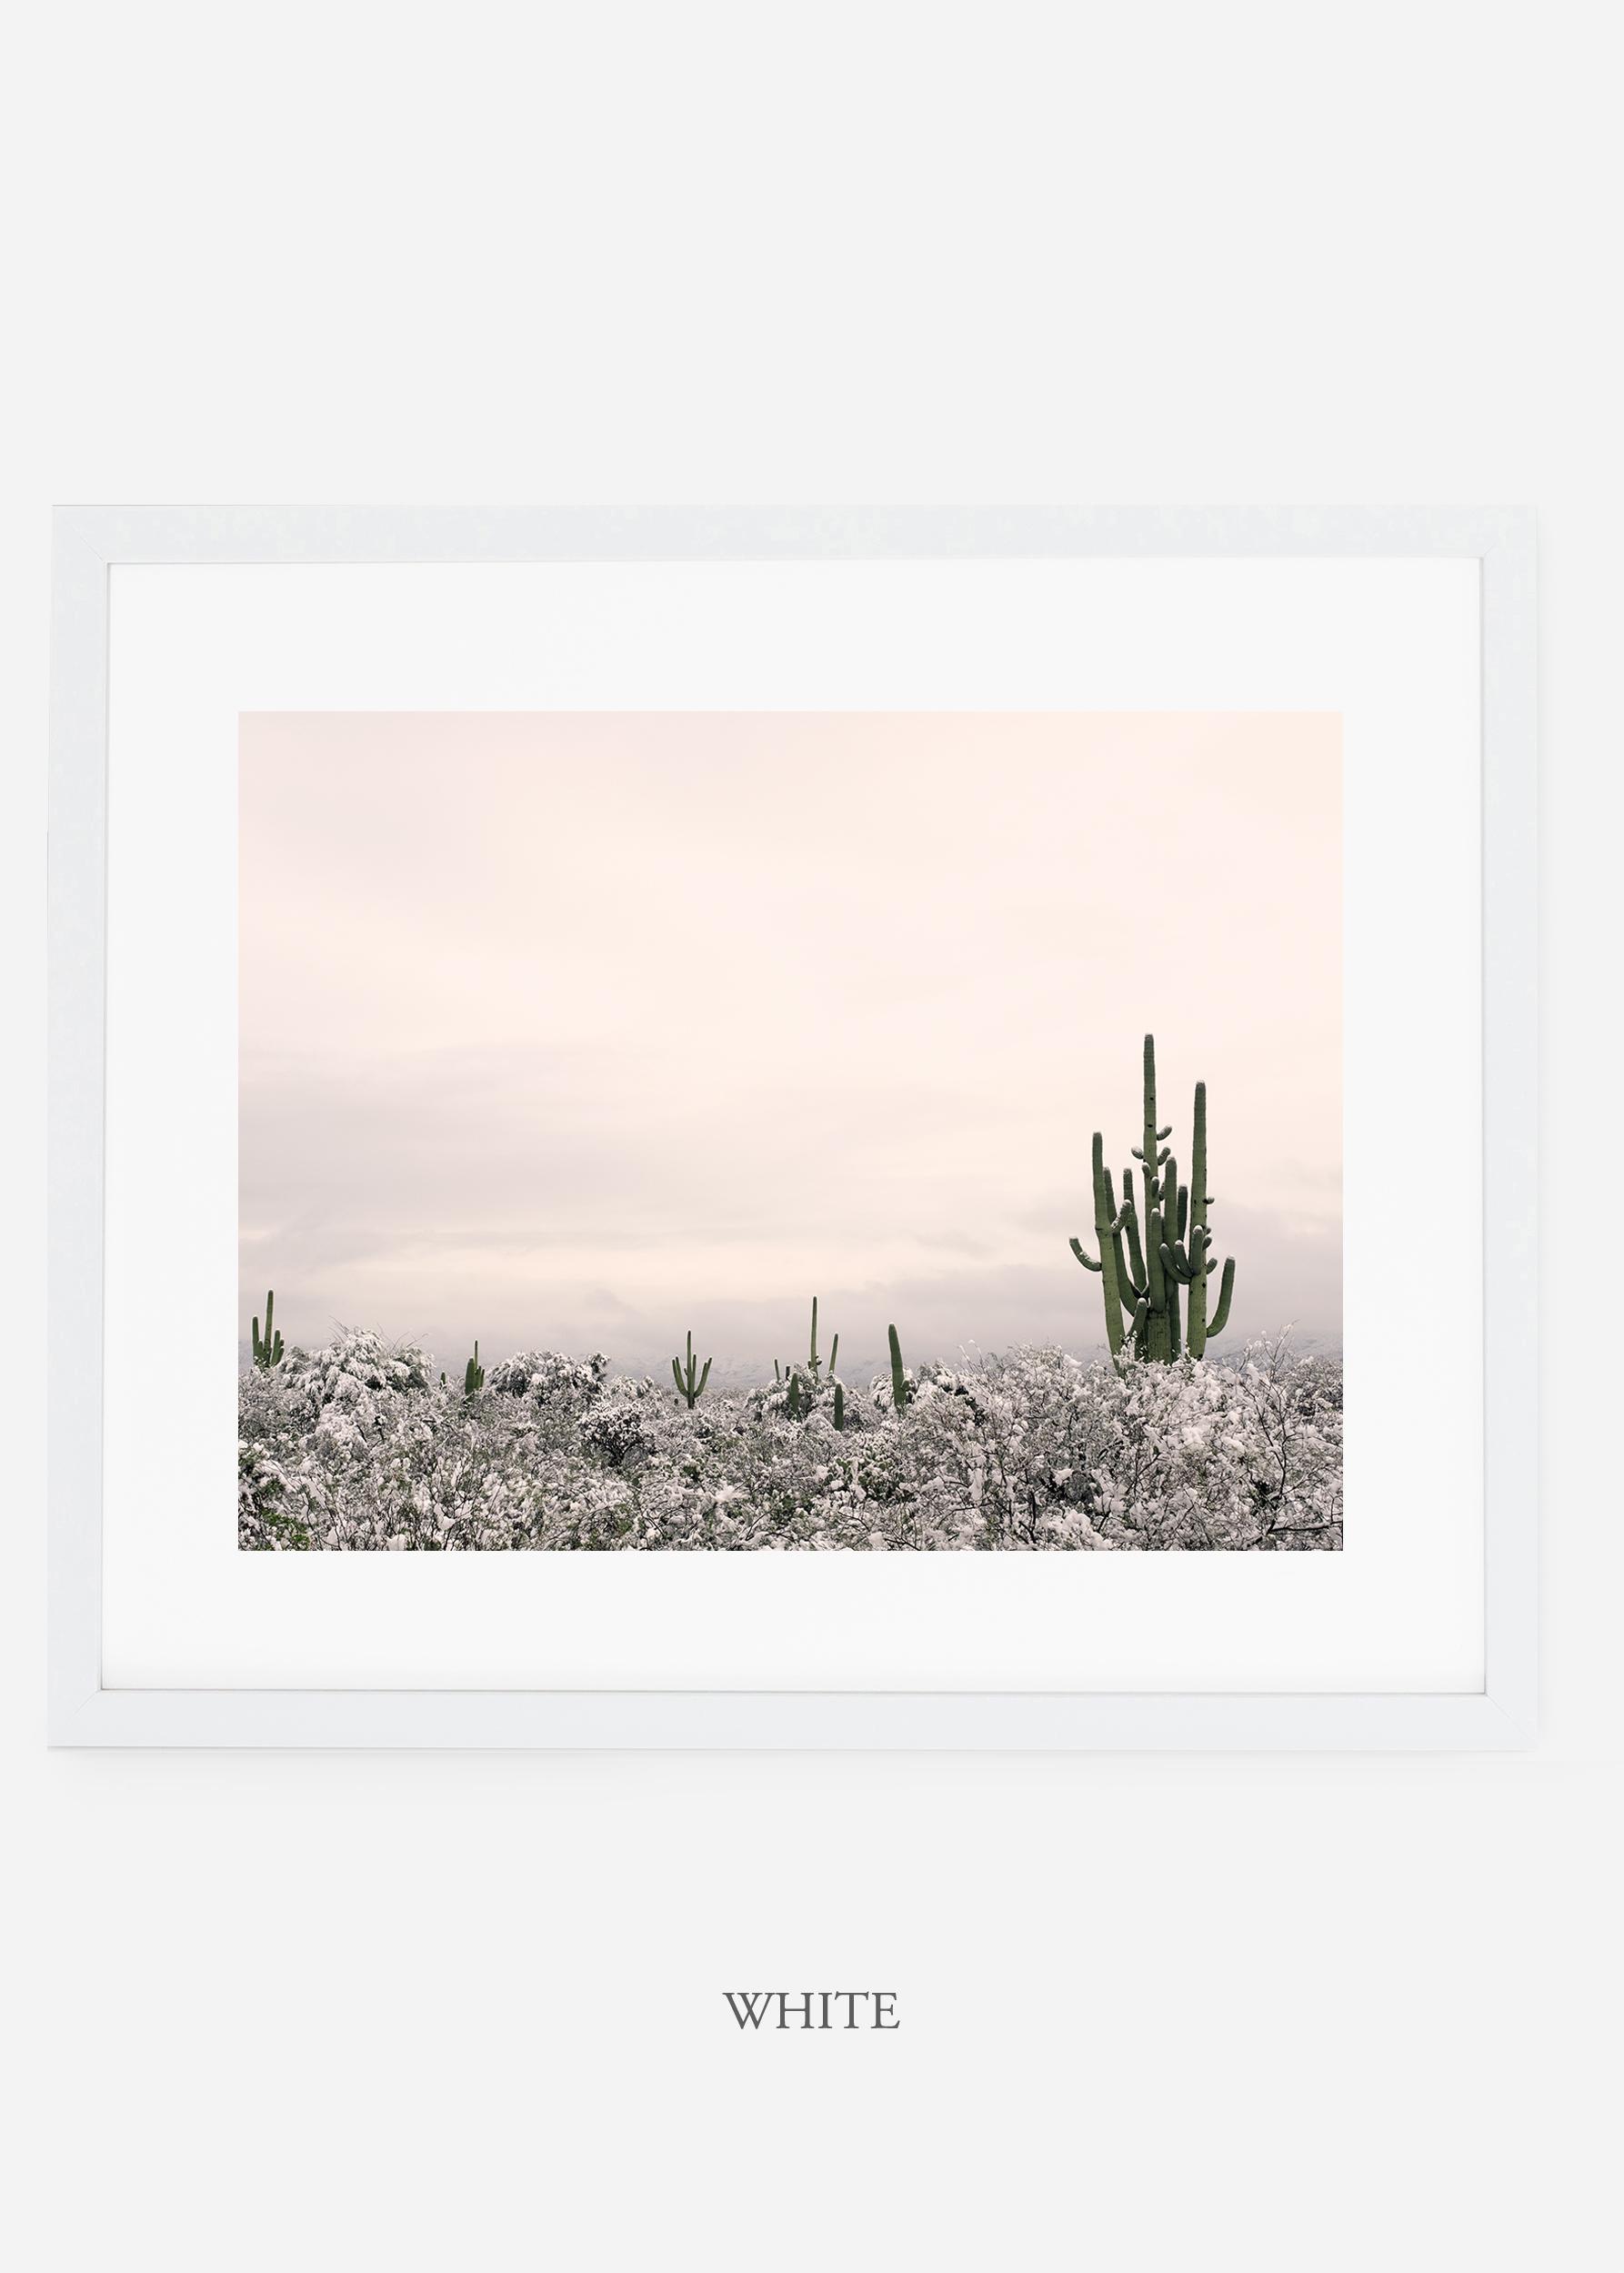 whiteframe-saguaroNo.7-wildercalifornia-art-wallart-cactusprint-homedecor-prints-arizona-botanical-artwork-interiordesign.jpg